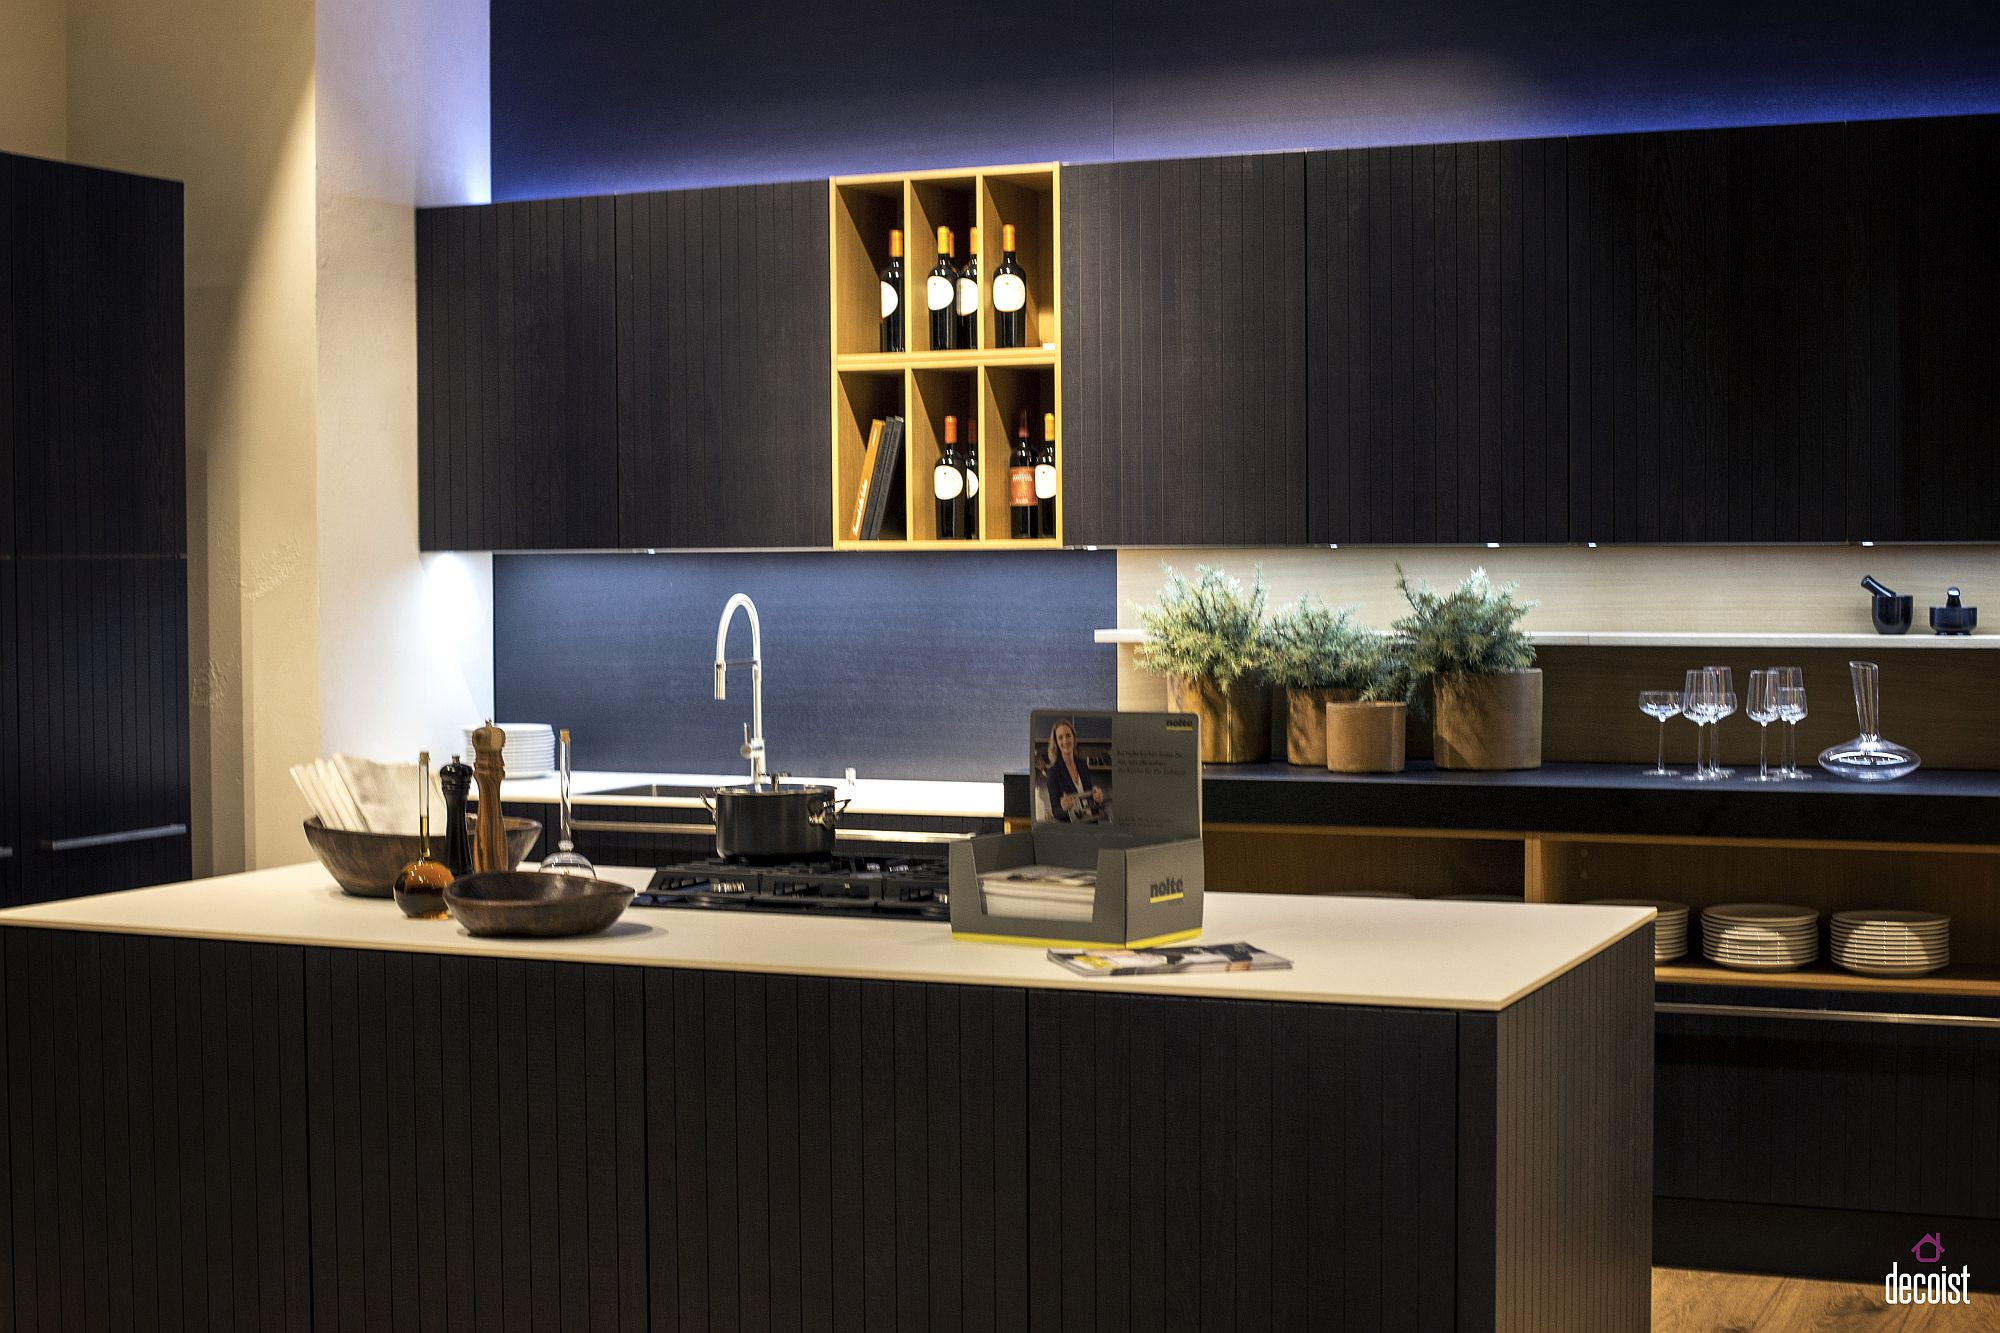 Lighting-the-dark-kitchen-right-makes-a-big-impact